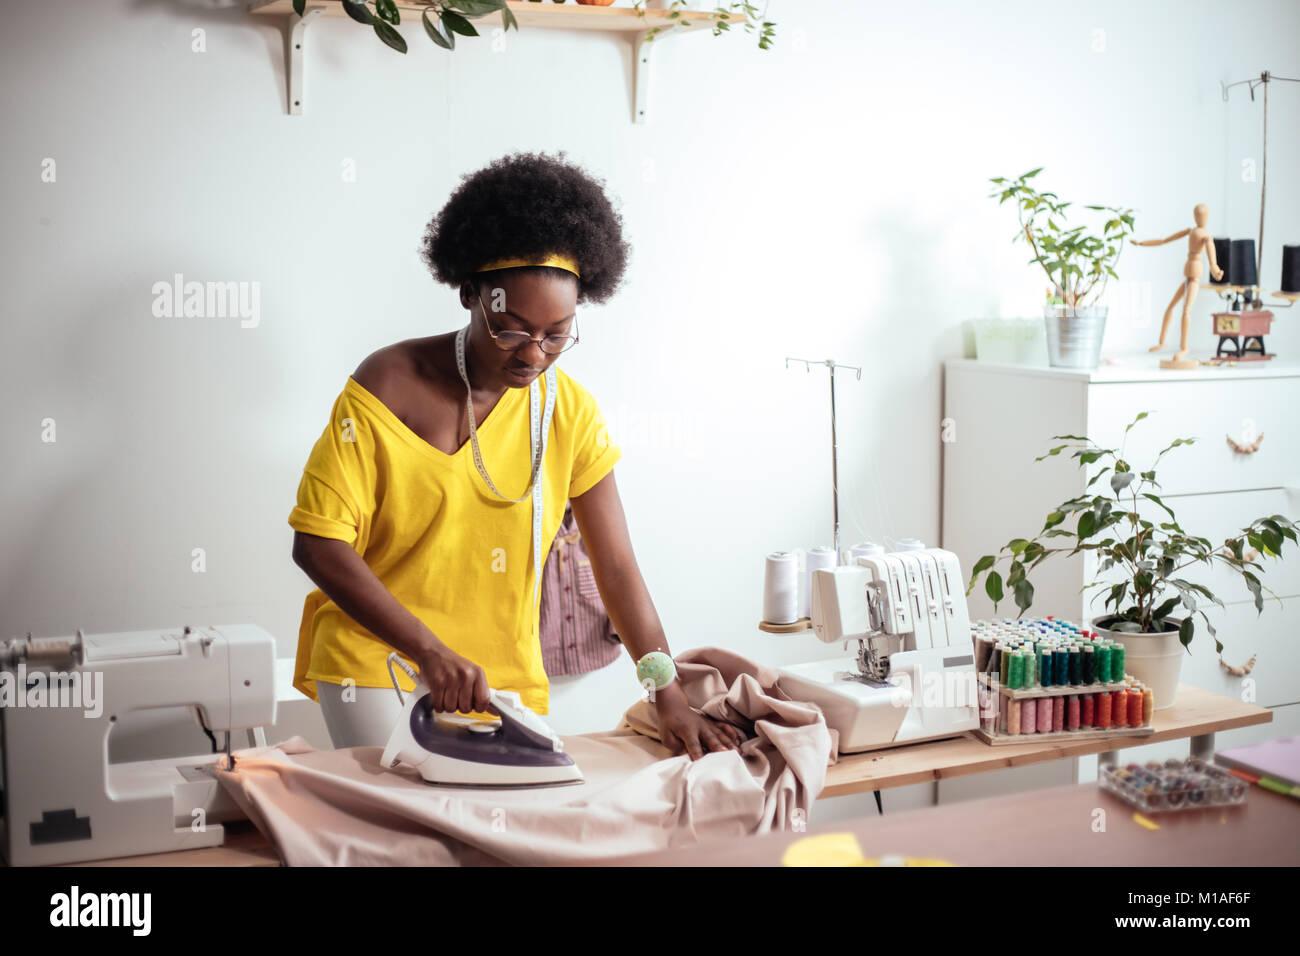 Mujer africana costurera paño de planchado Imagen De Stock